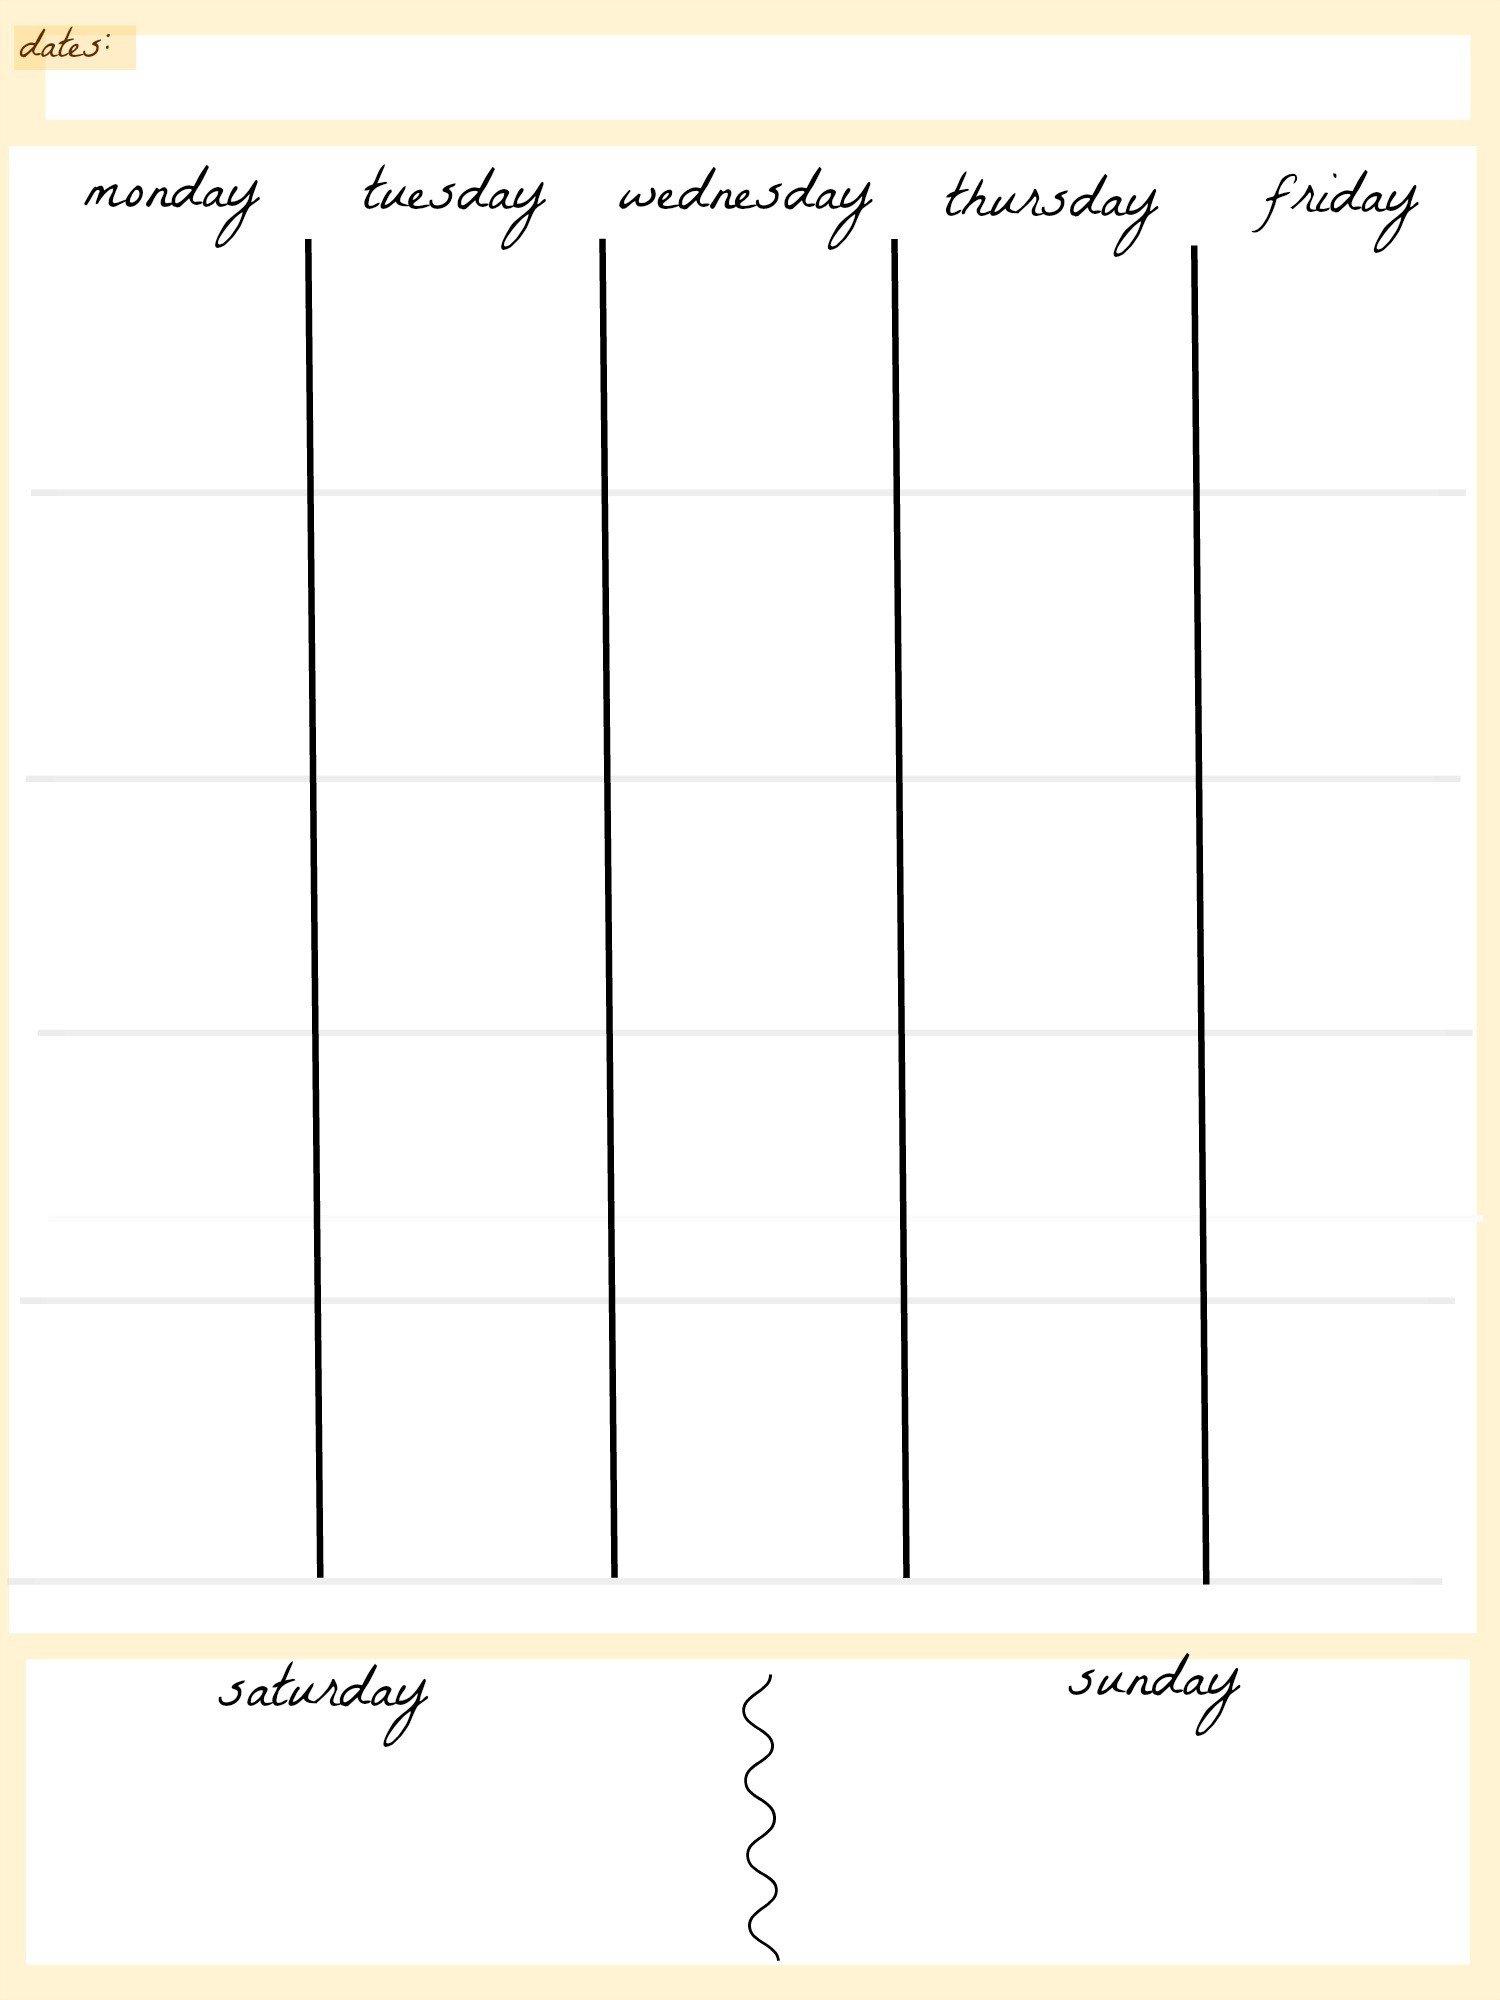 5 Day Week Calendar Template | Example Calendar Printable Blank 4 Week Calendar